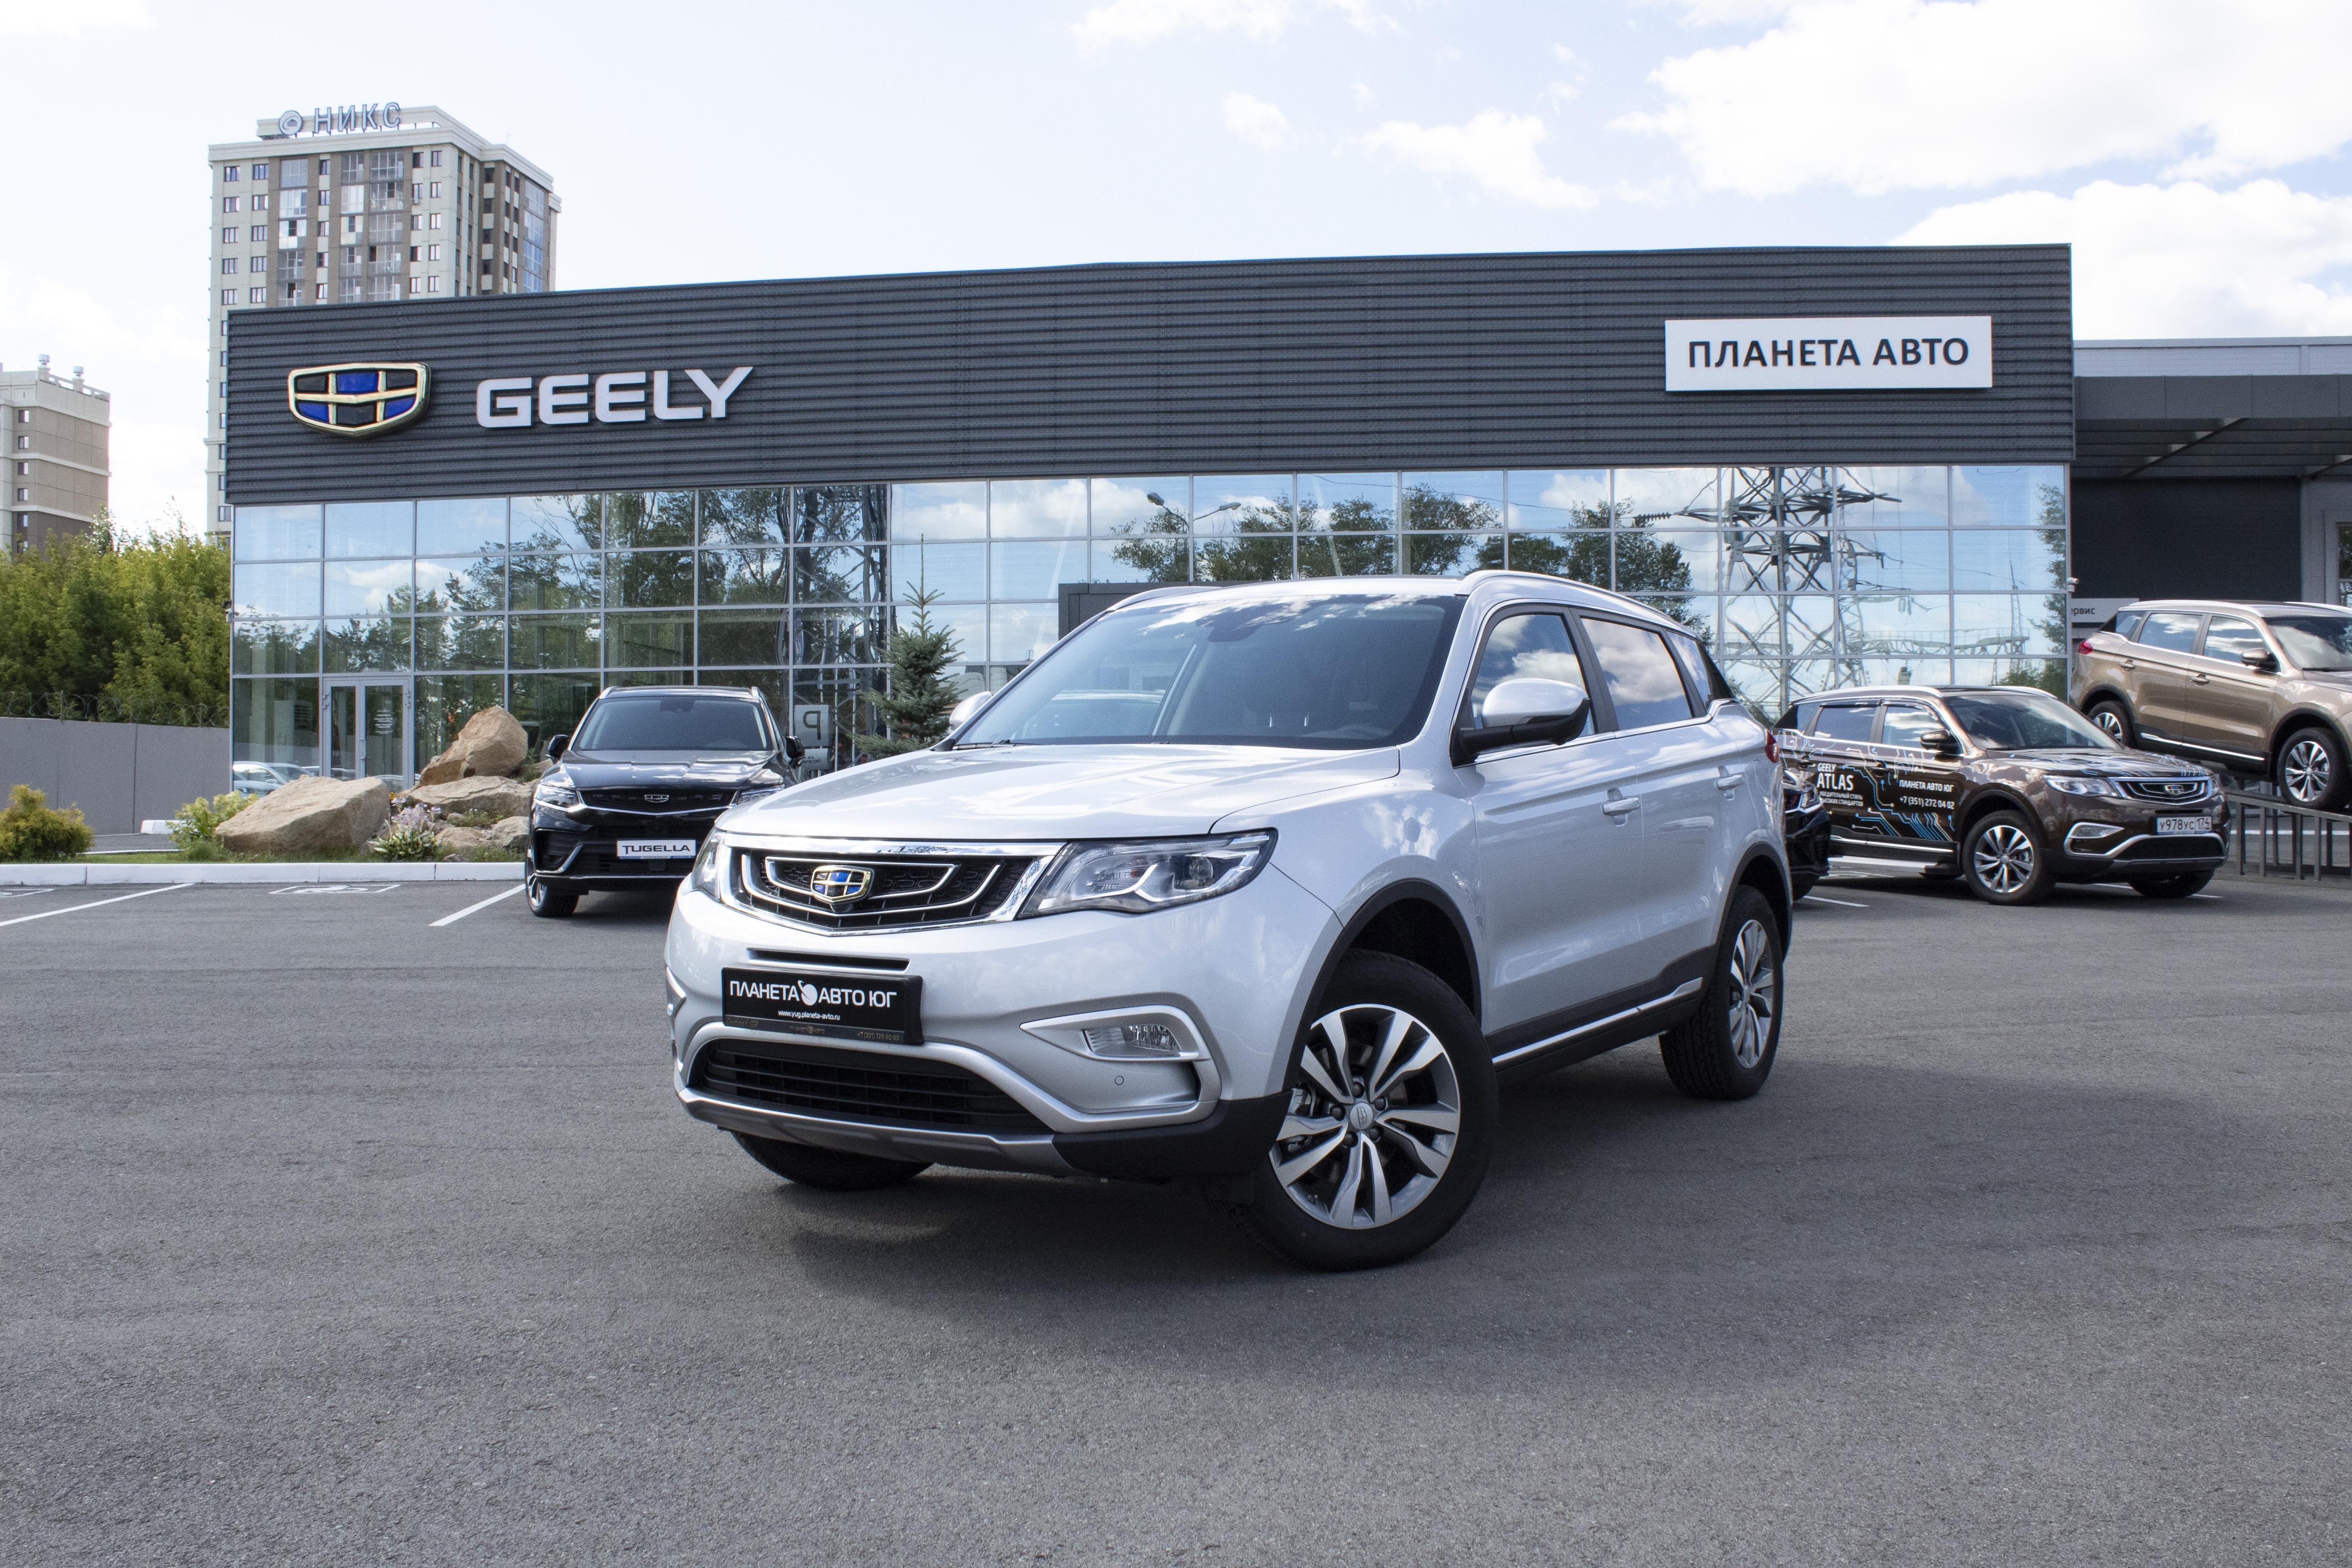 Geely Atlas 2.4 6AT 2WD (149 л.с.) Luxury LED+ Yandex Auto